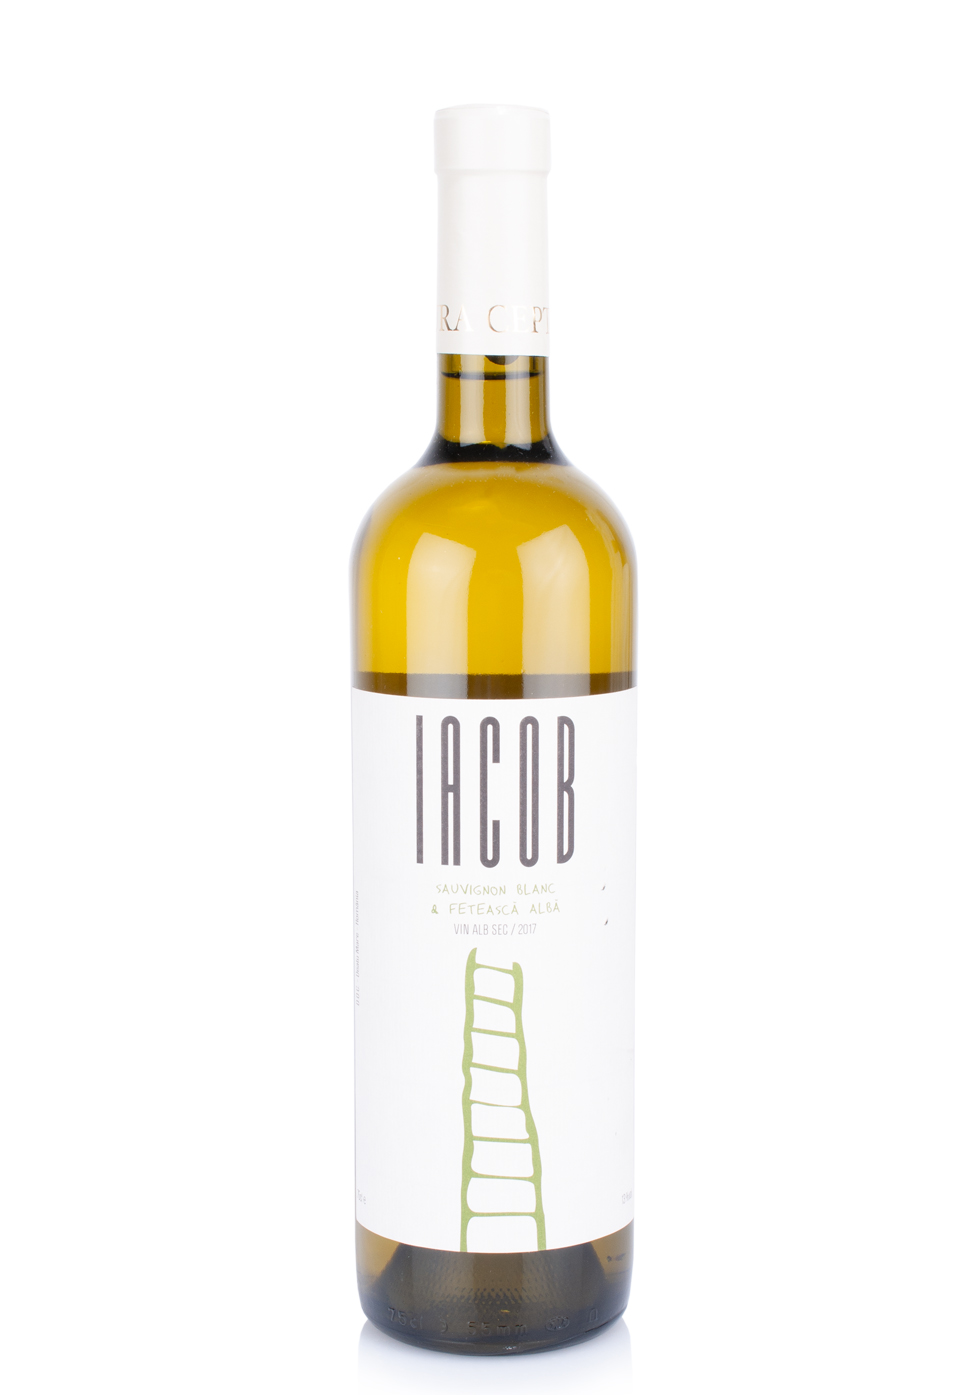 Vin Davino, Iacob Alb, Sauvignon Blanc & Feteasca Alba 2019 (0.75L)